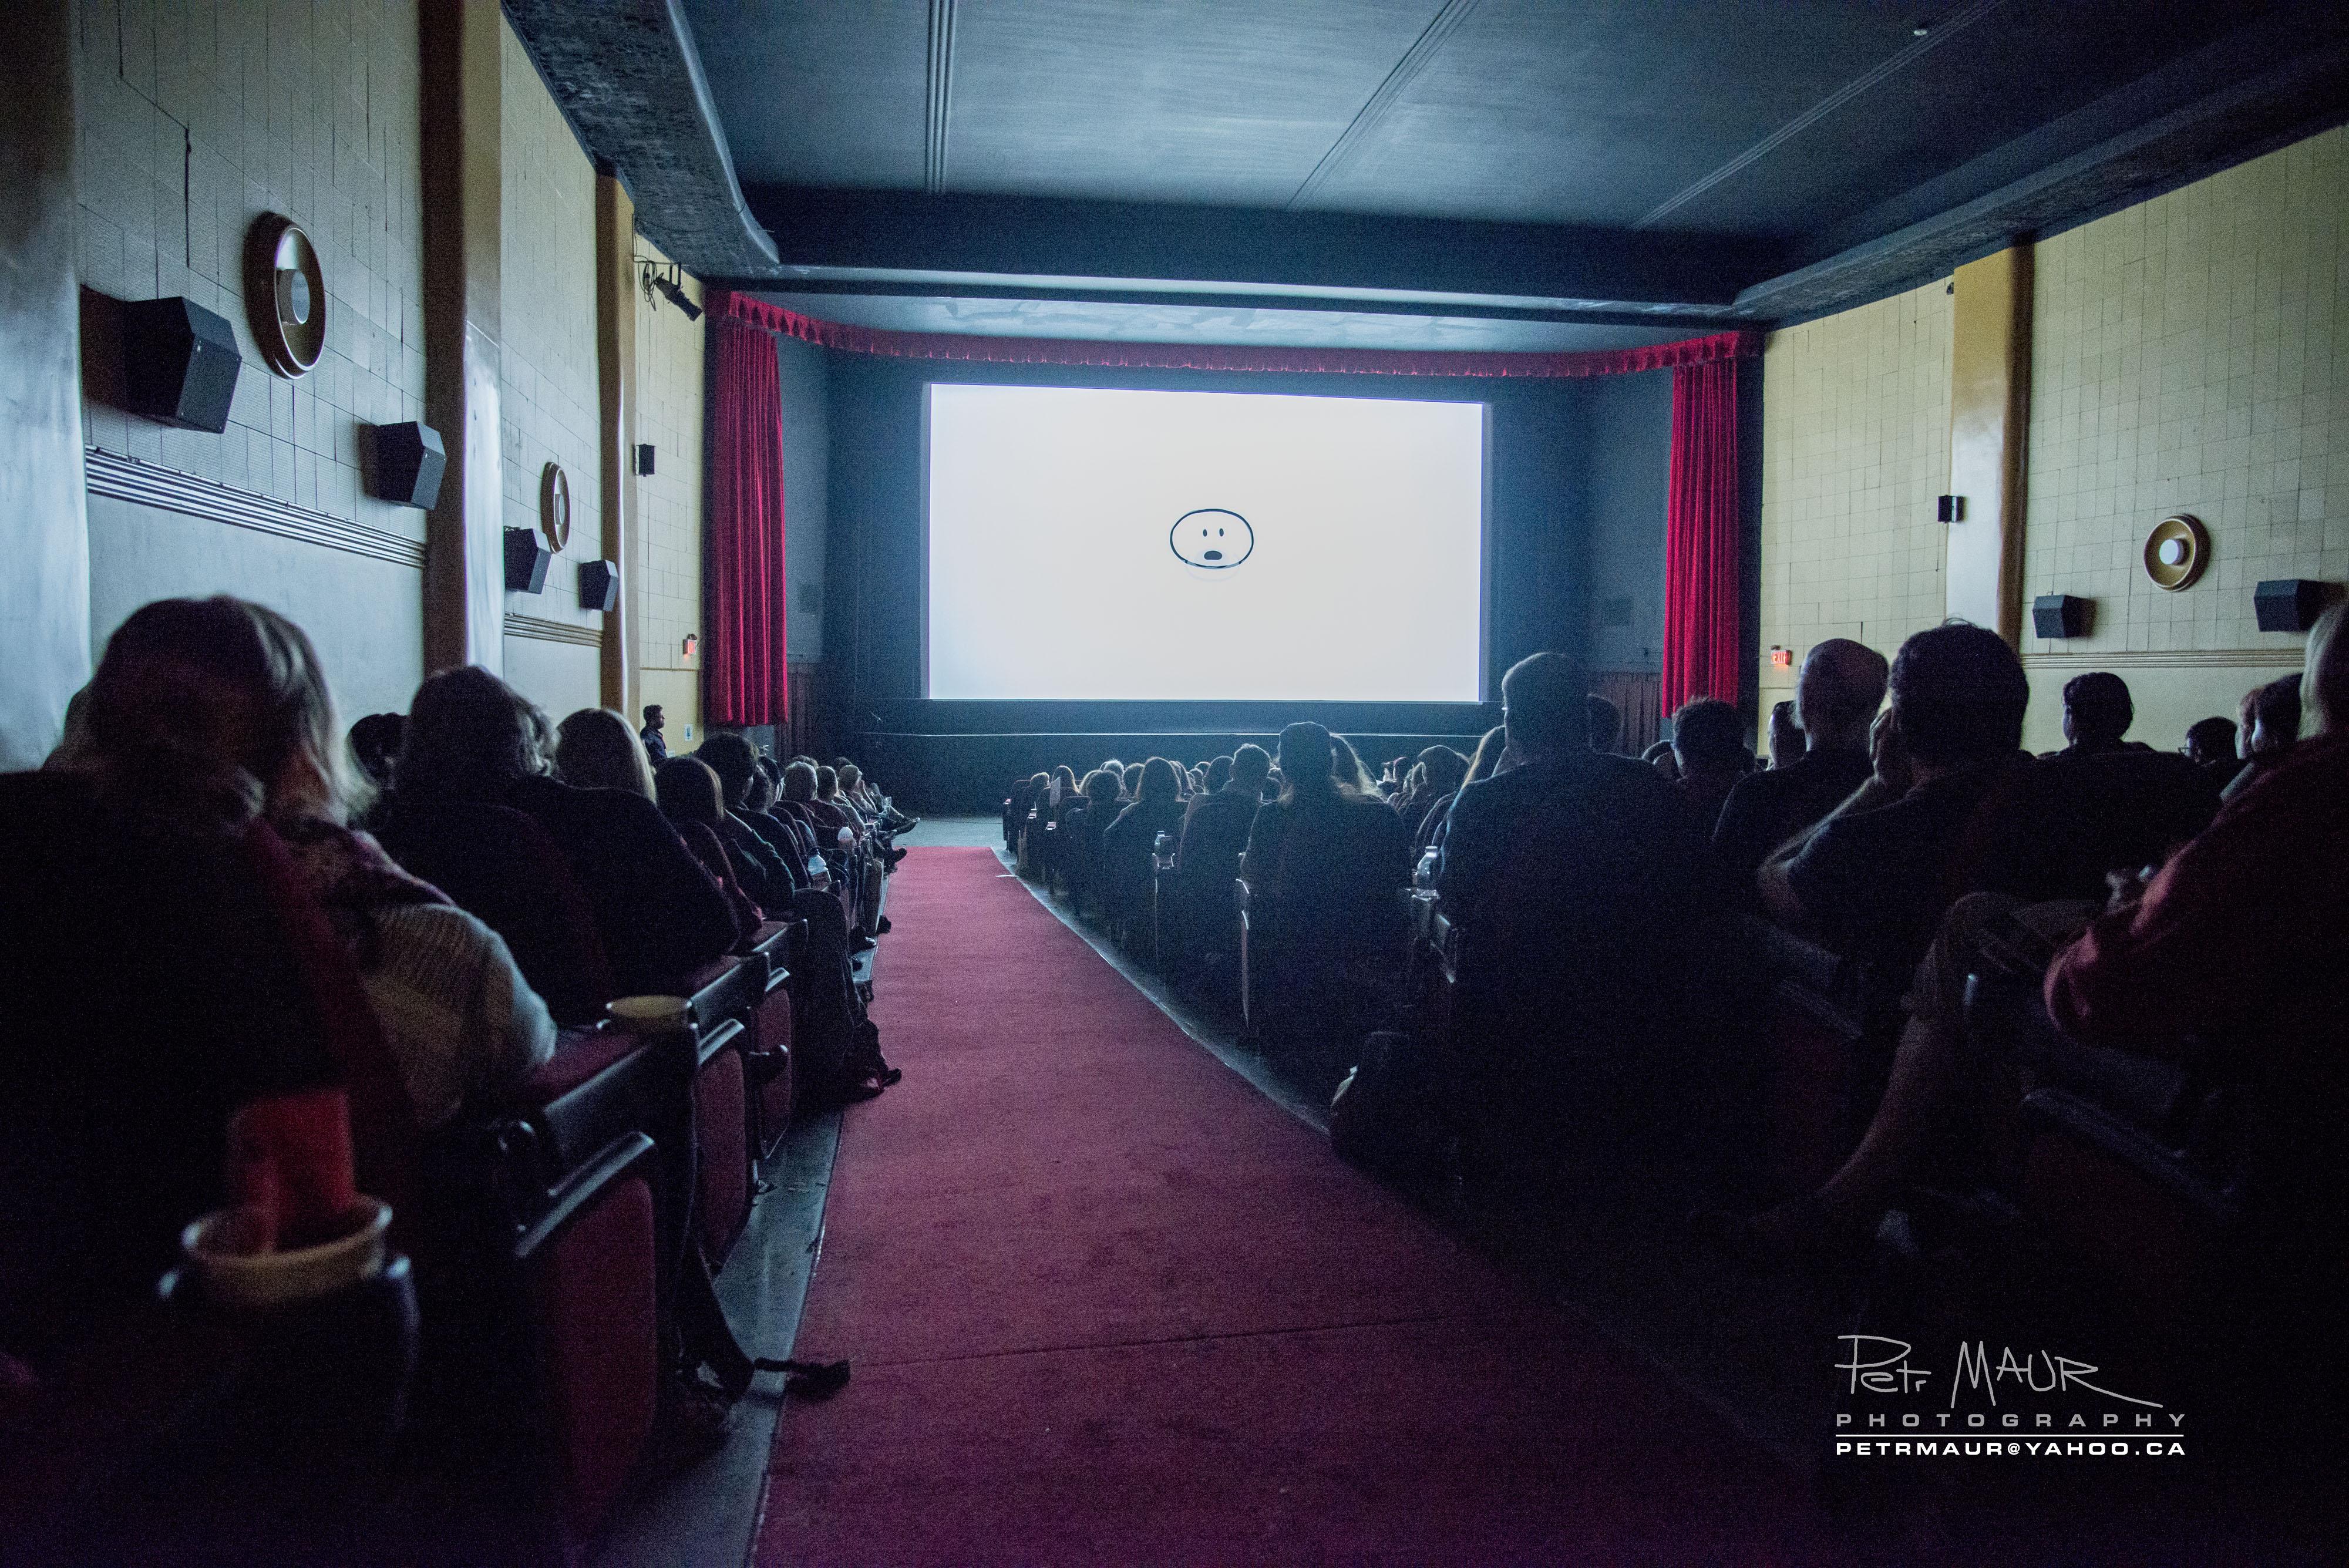 ottawa international animation festival oiaf ottawa festivals in the nation s capital come and enjoy the world s most cutting edge fun various locations in ottawa true mm dd yyyy outlookgoogleicaladdevent com